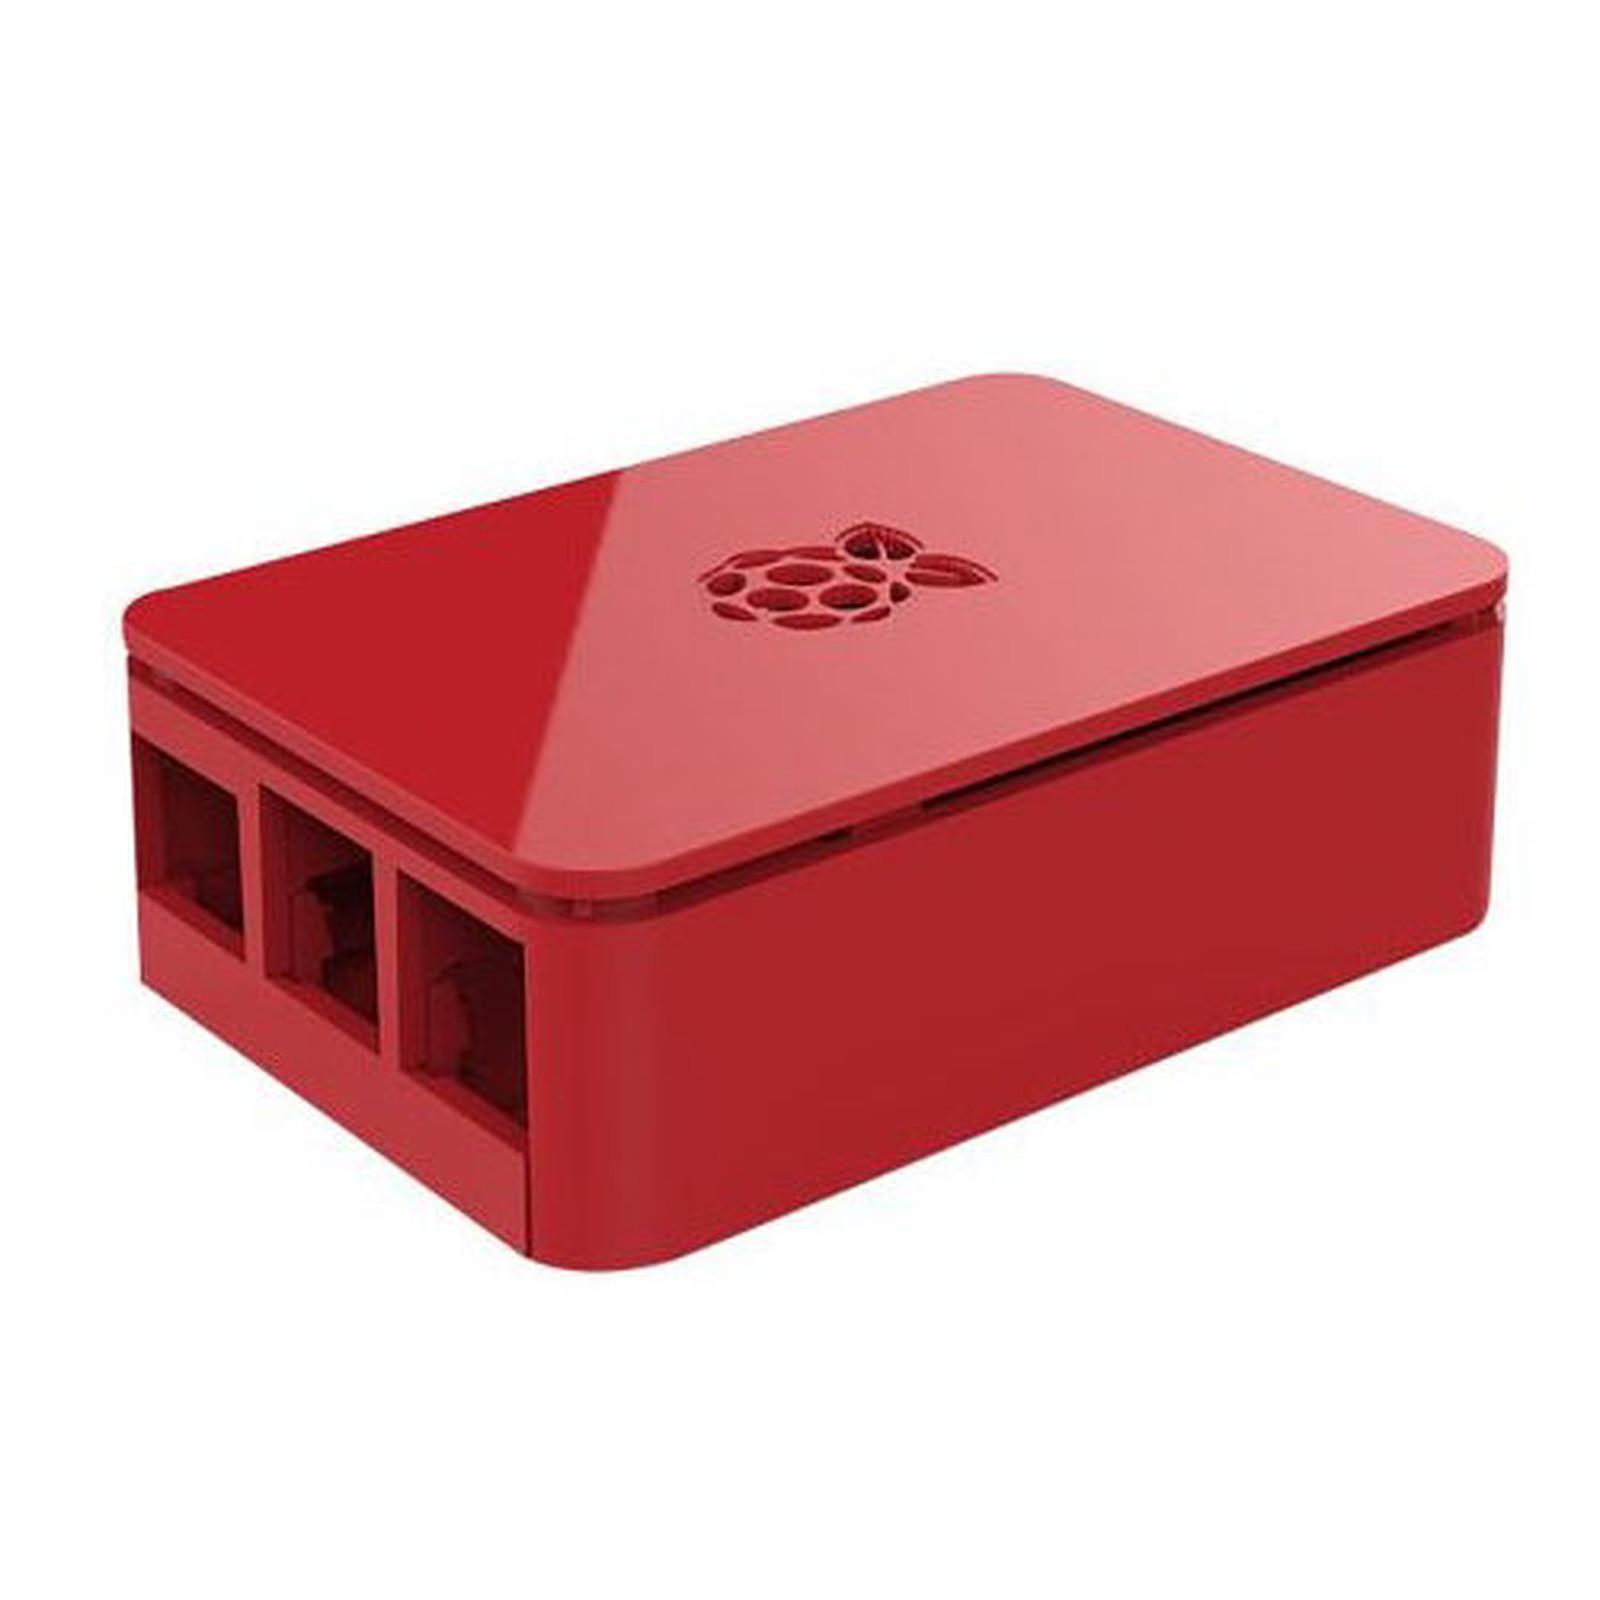 Boitier pour Raspberry Pi 3 B+ (Rouge)